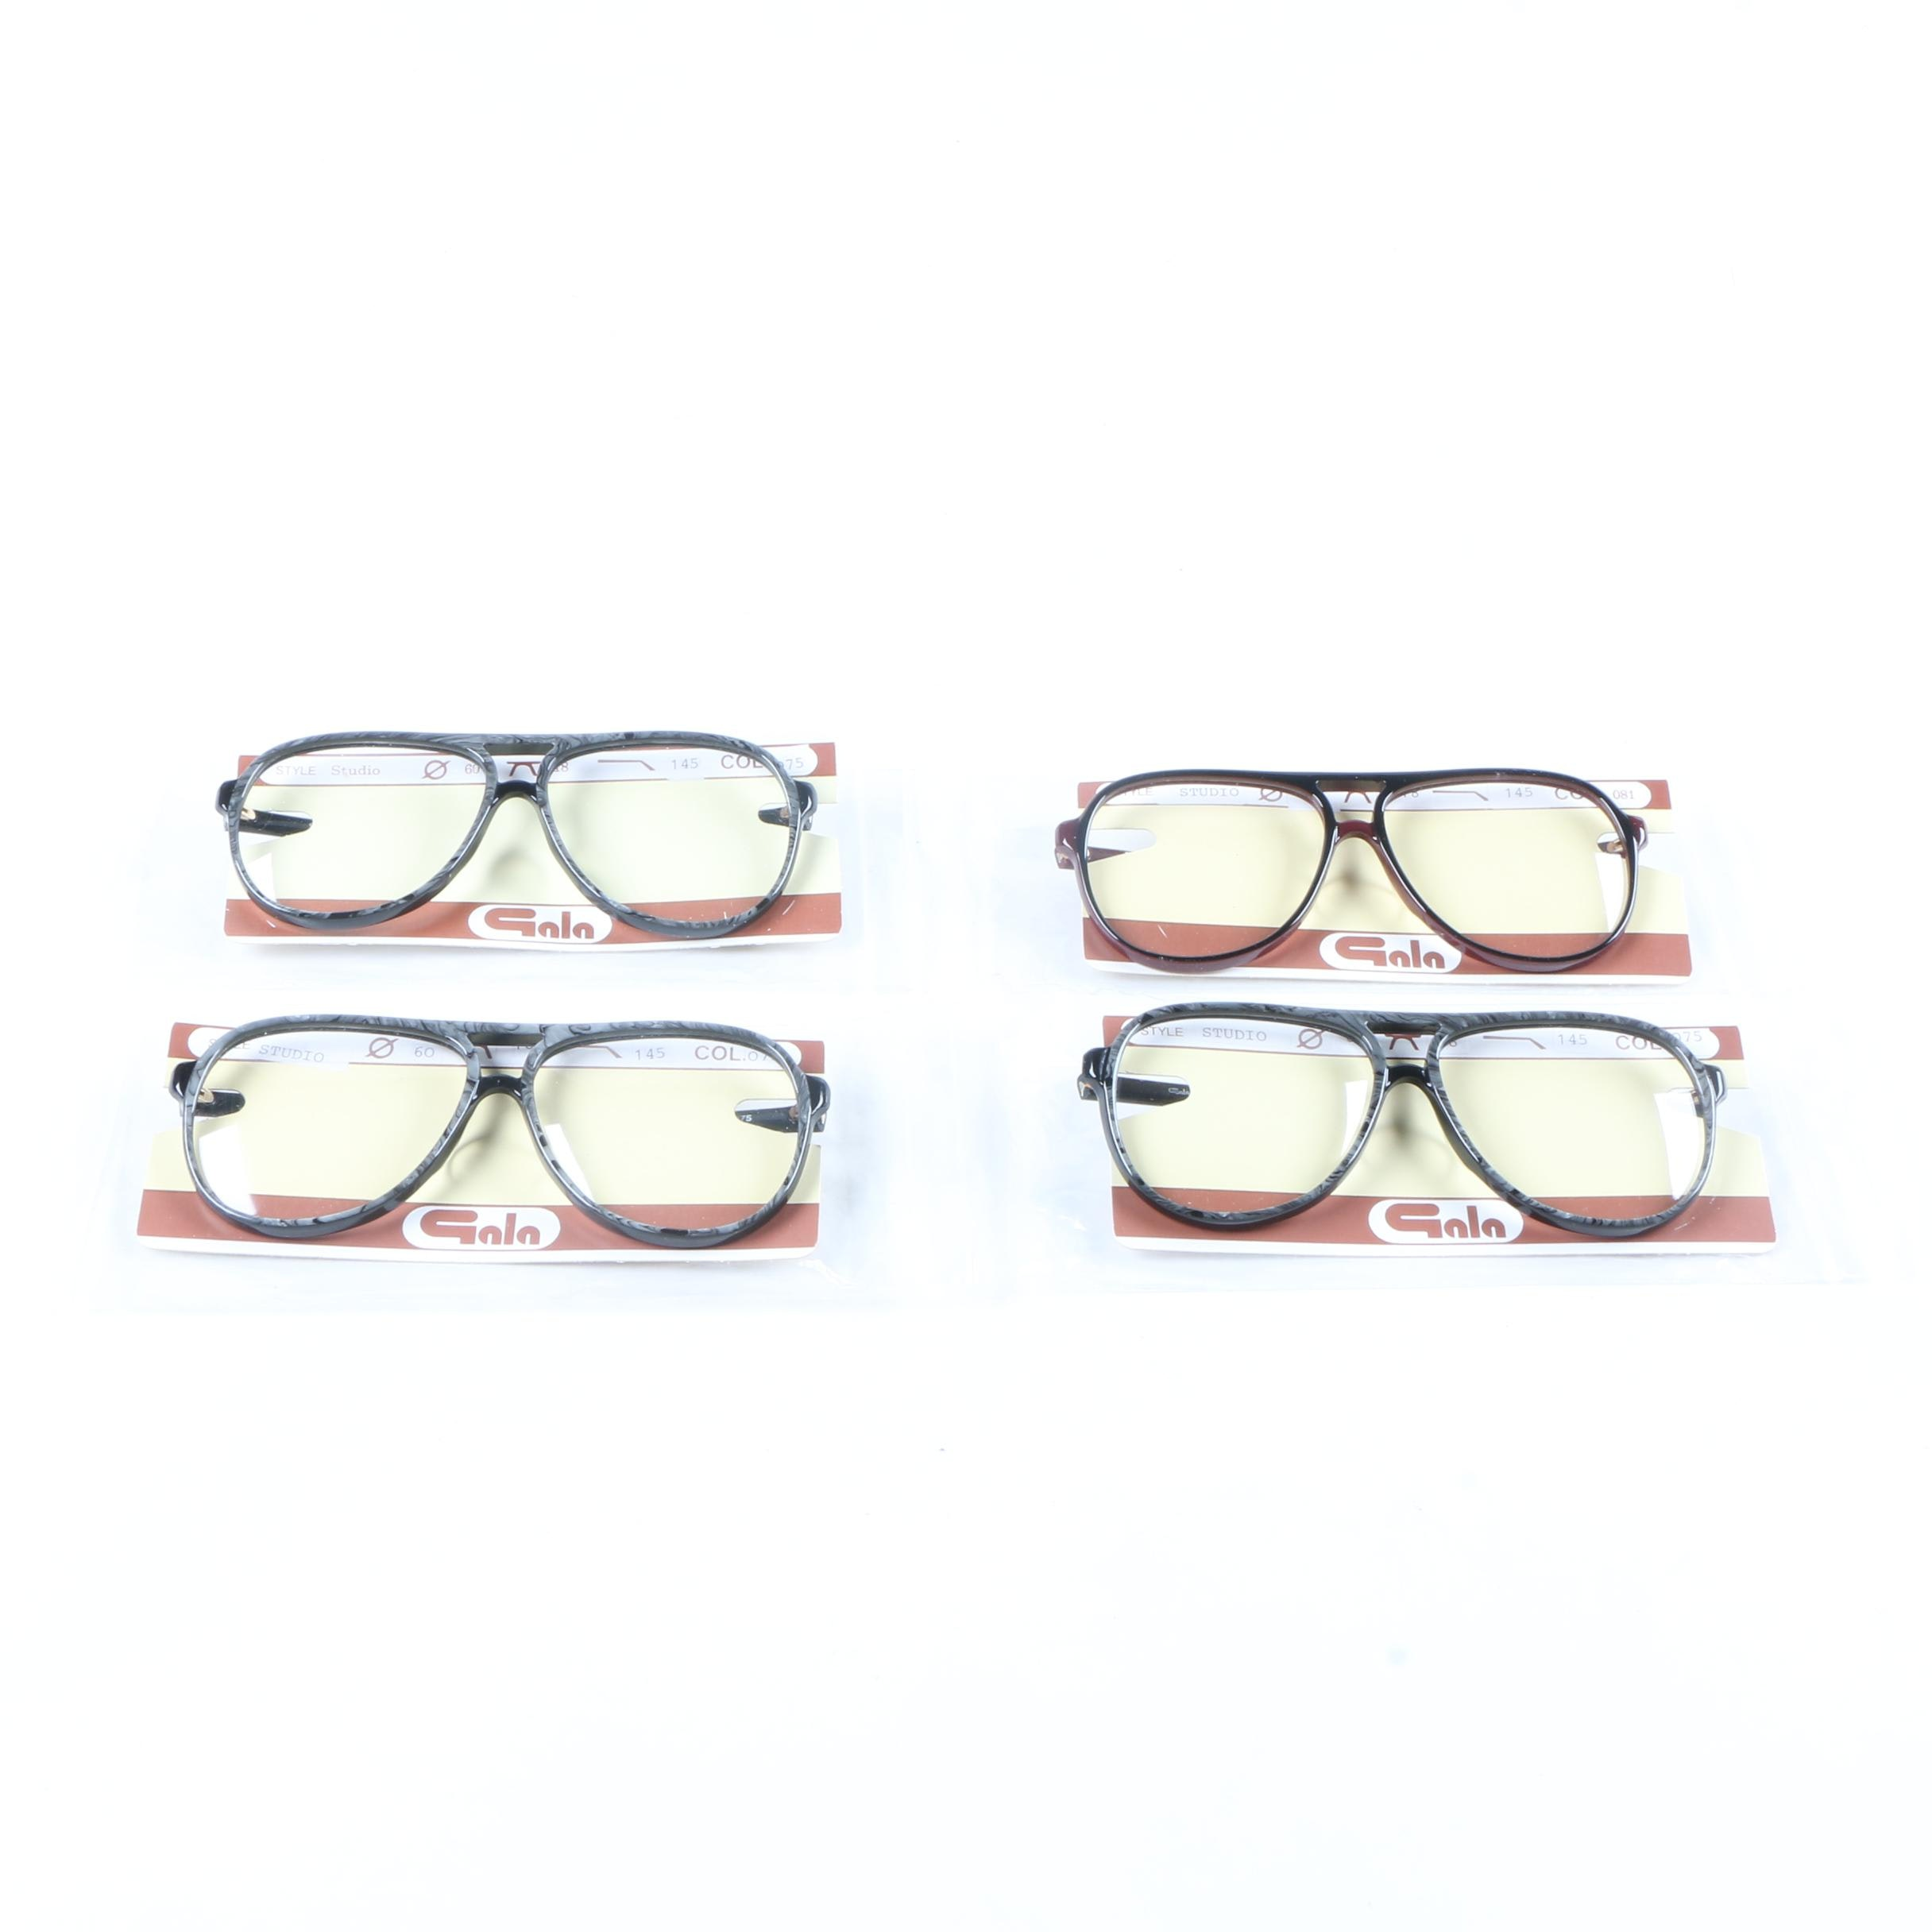 Vintage Aviator Style Glasses